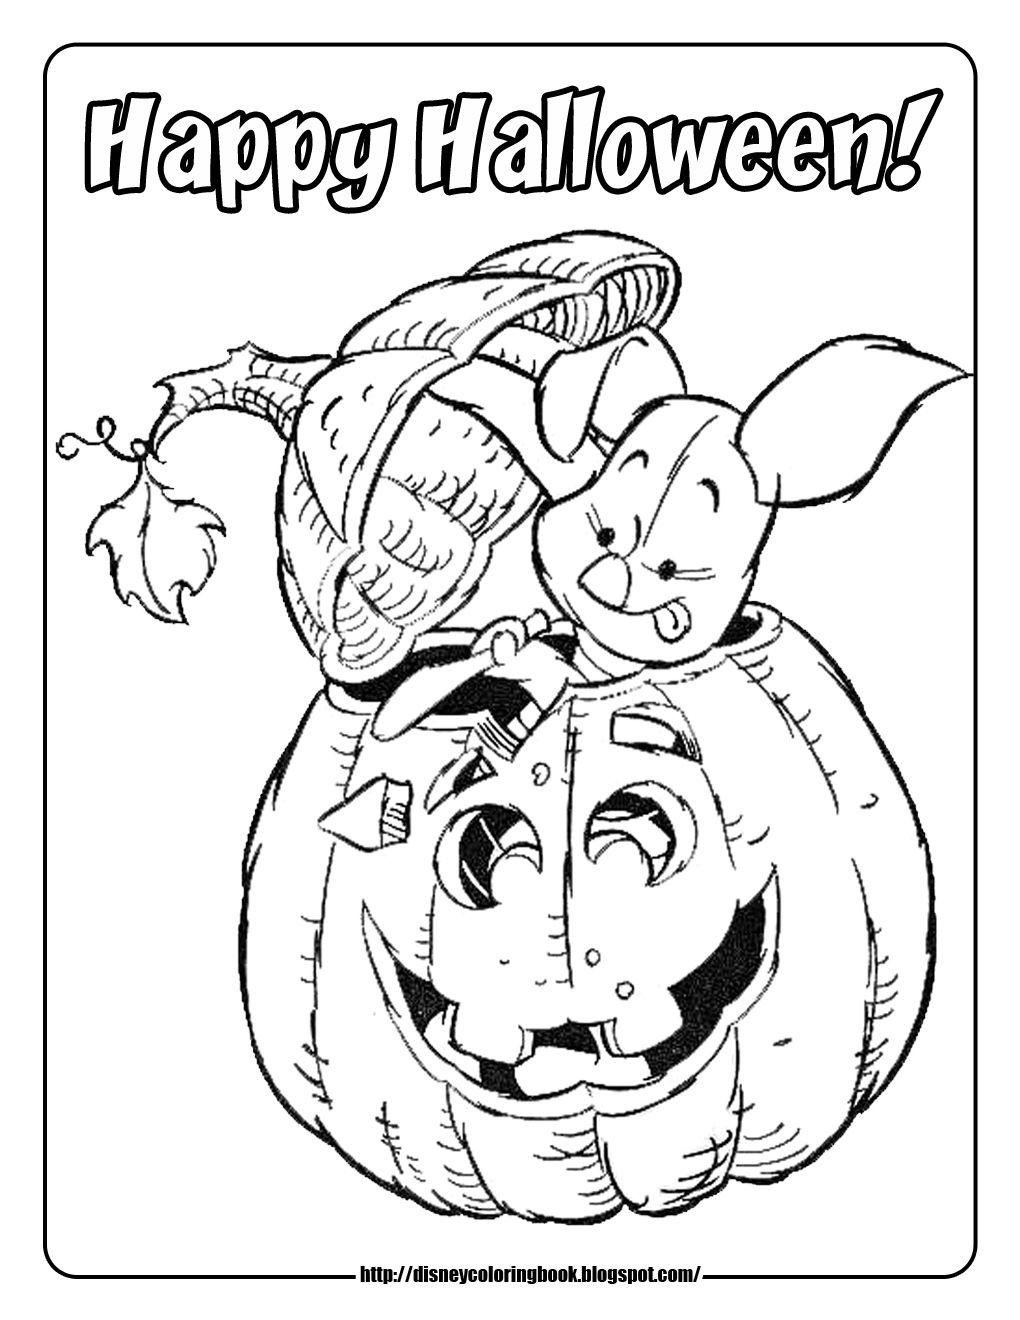 Halloween coloring pages Piglet carving pumpkin Pumpkin